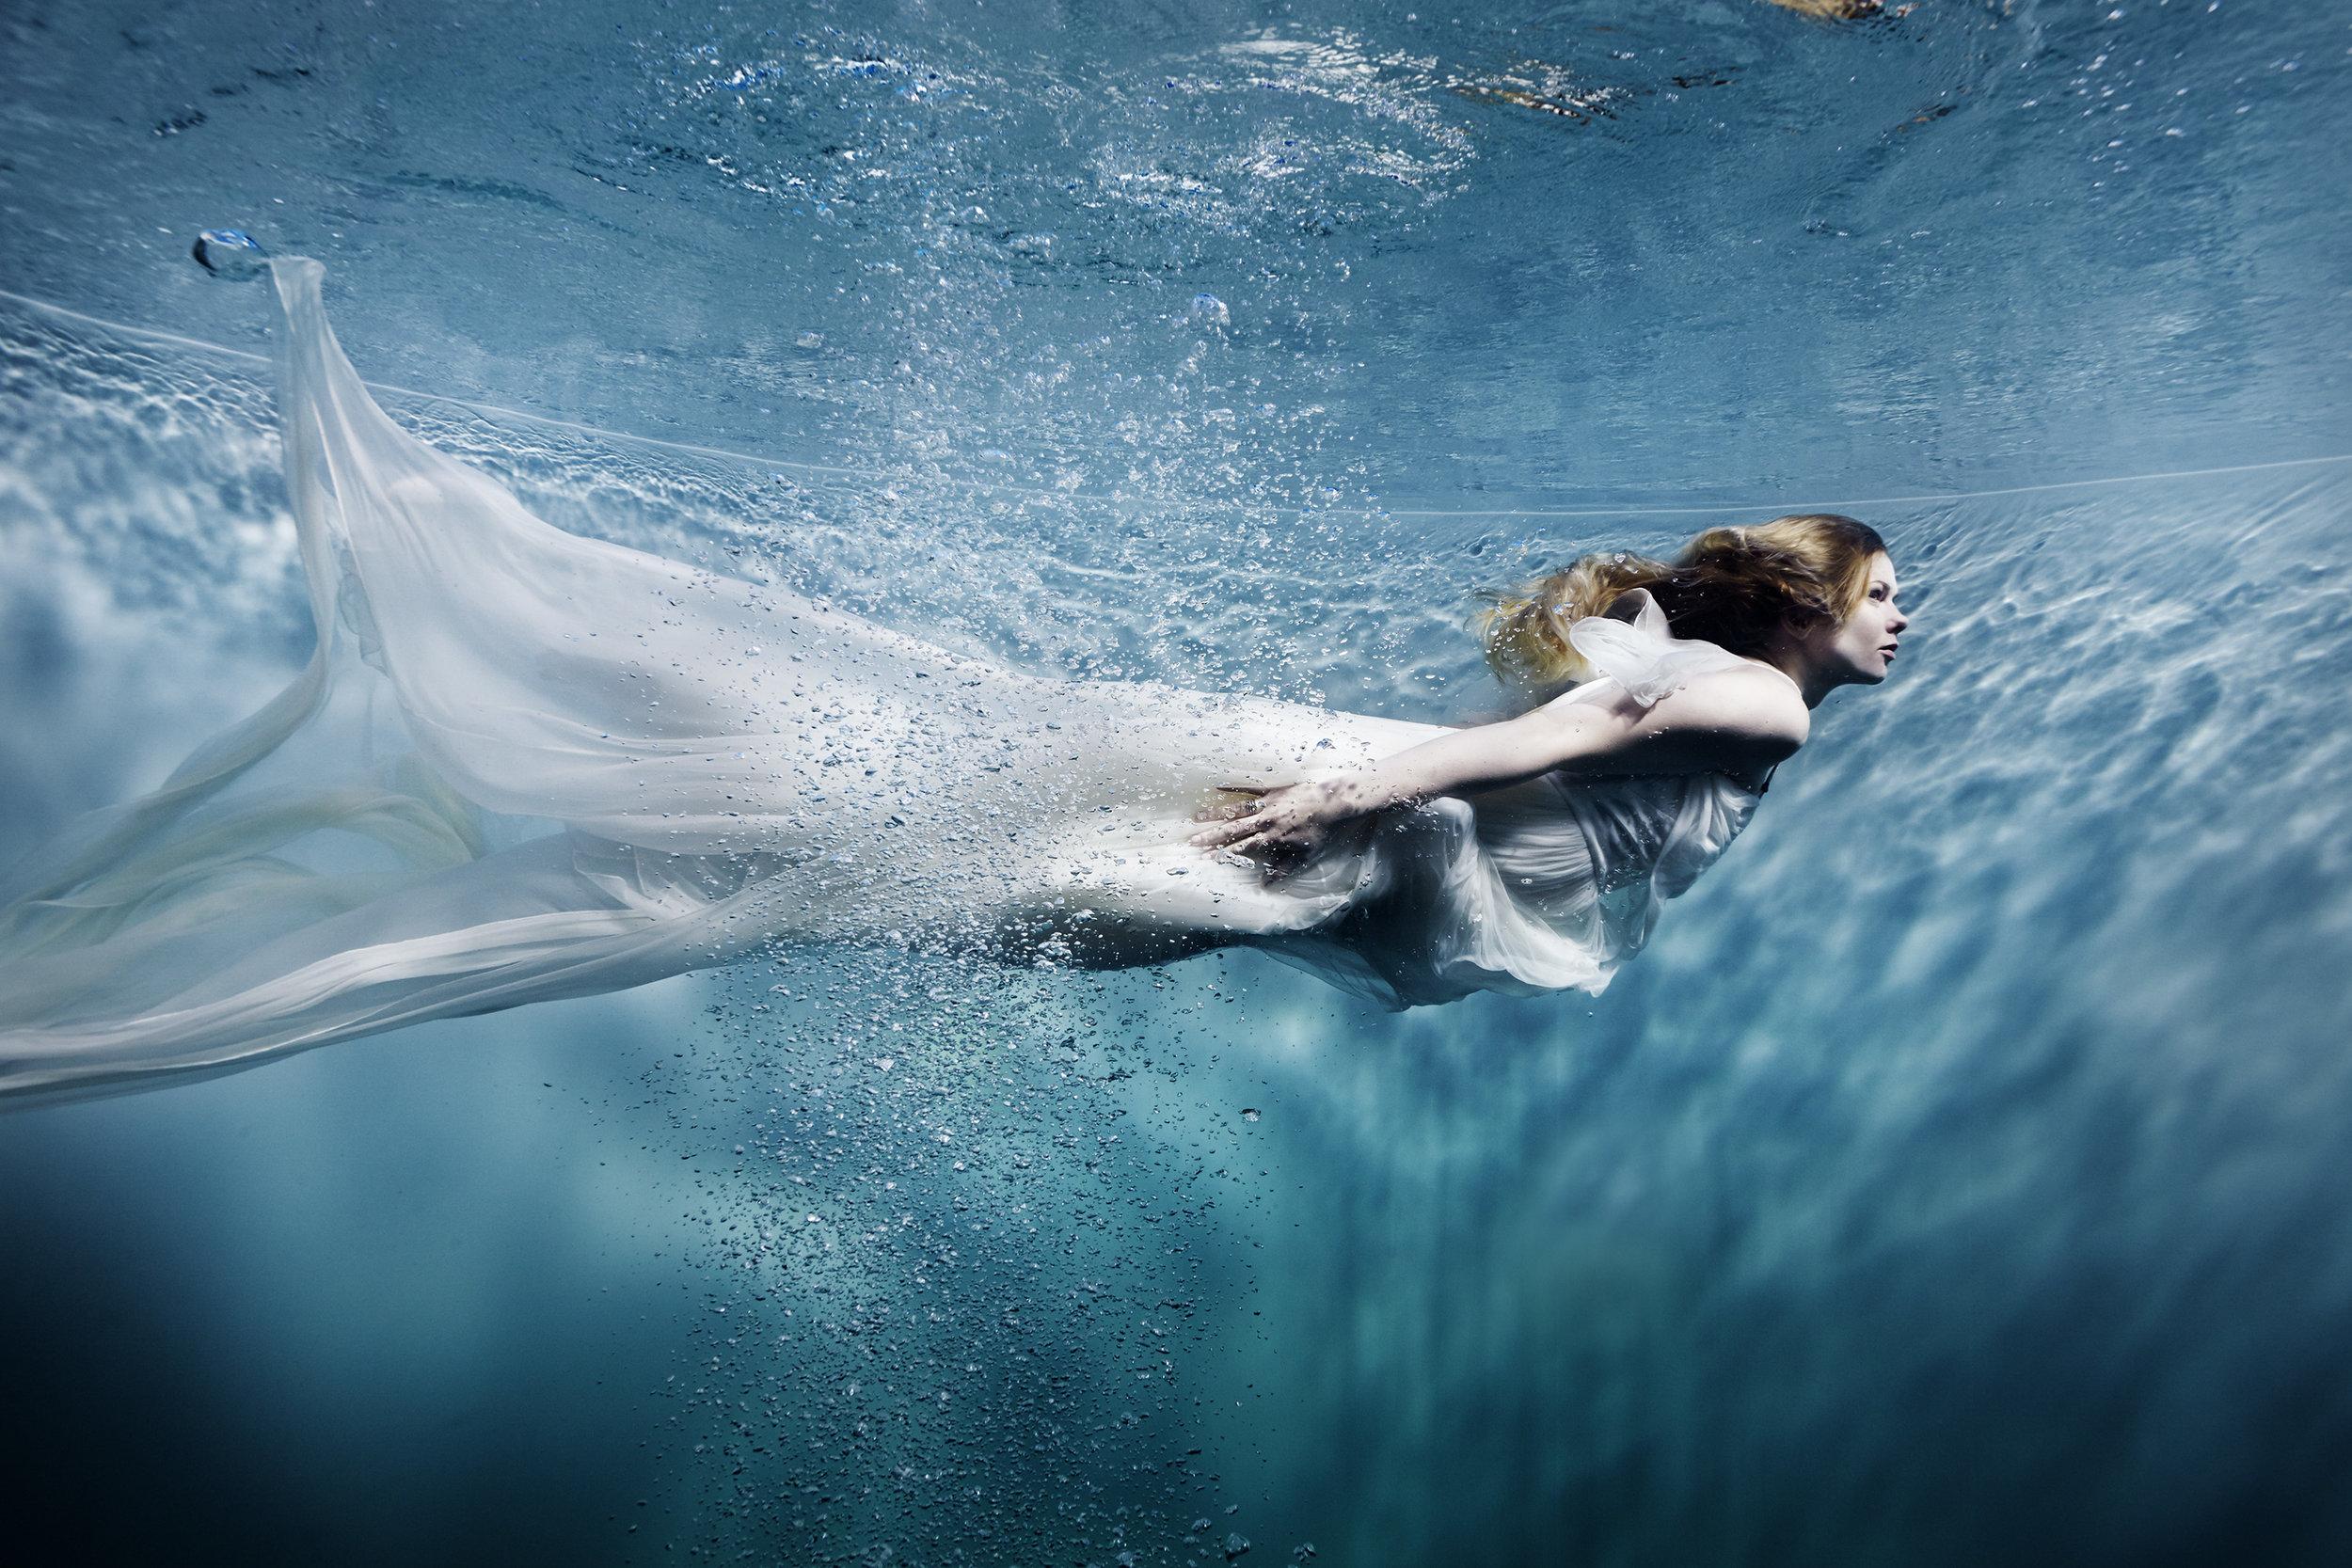 Susanne Stemmer girl swimming underwater in long dress